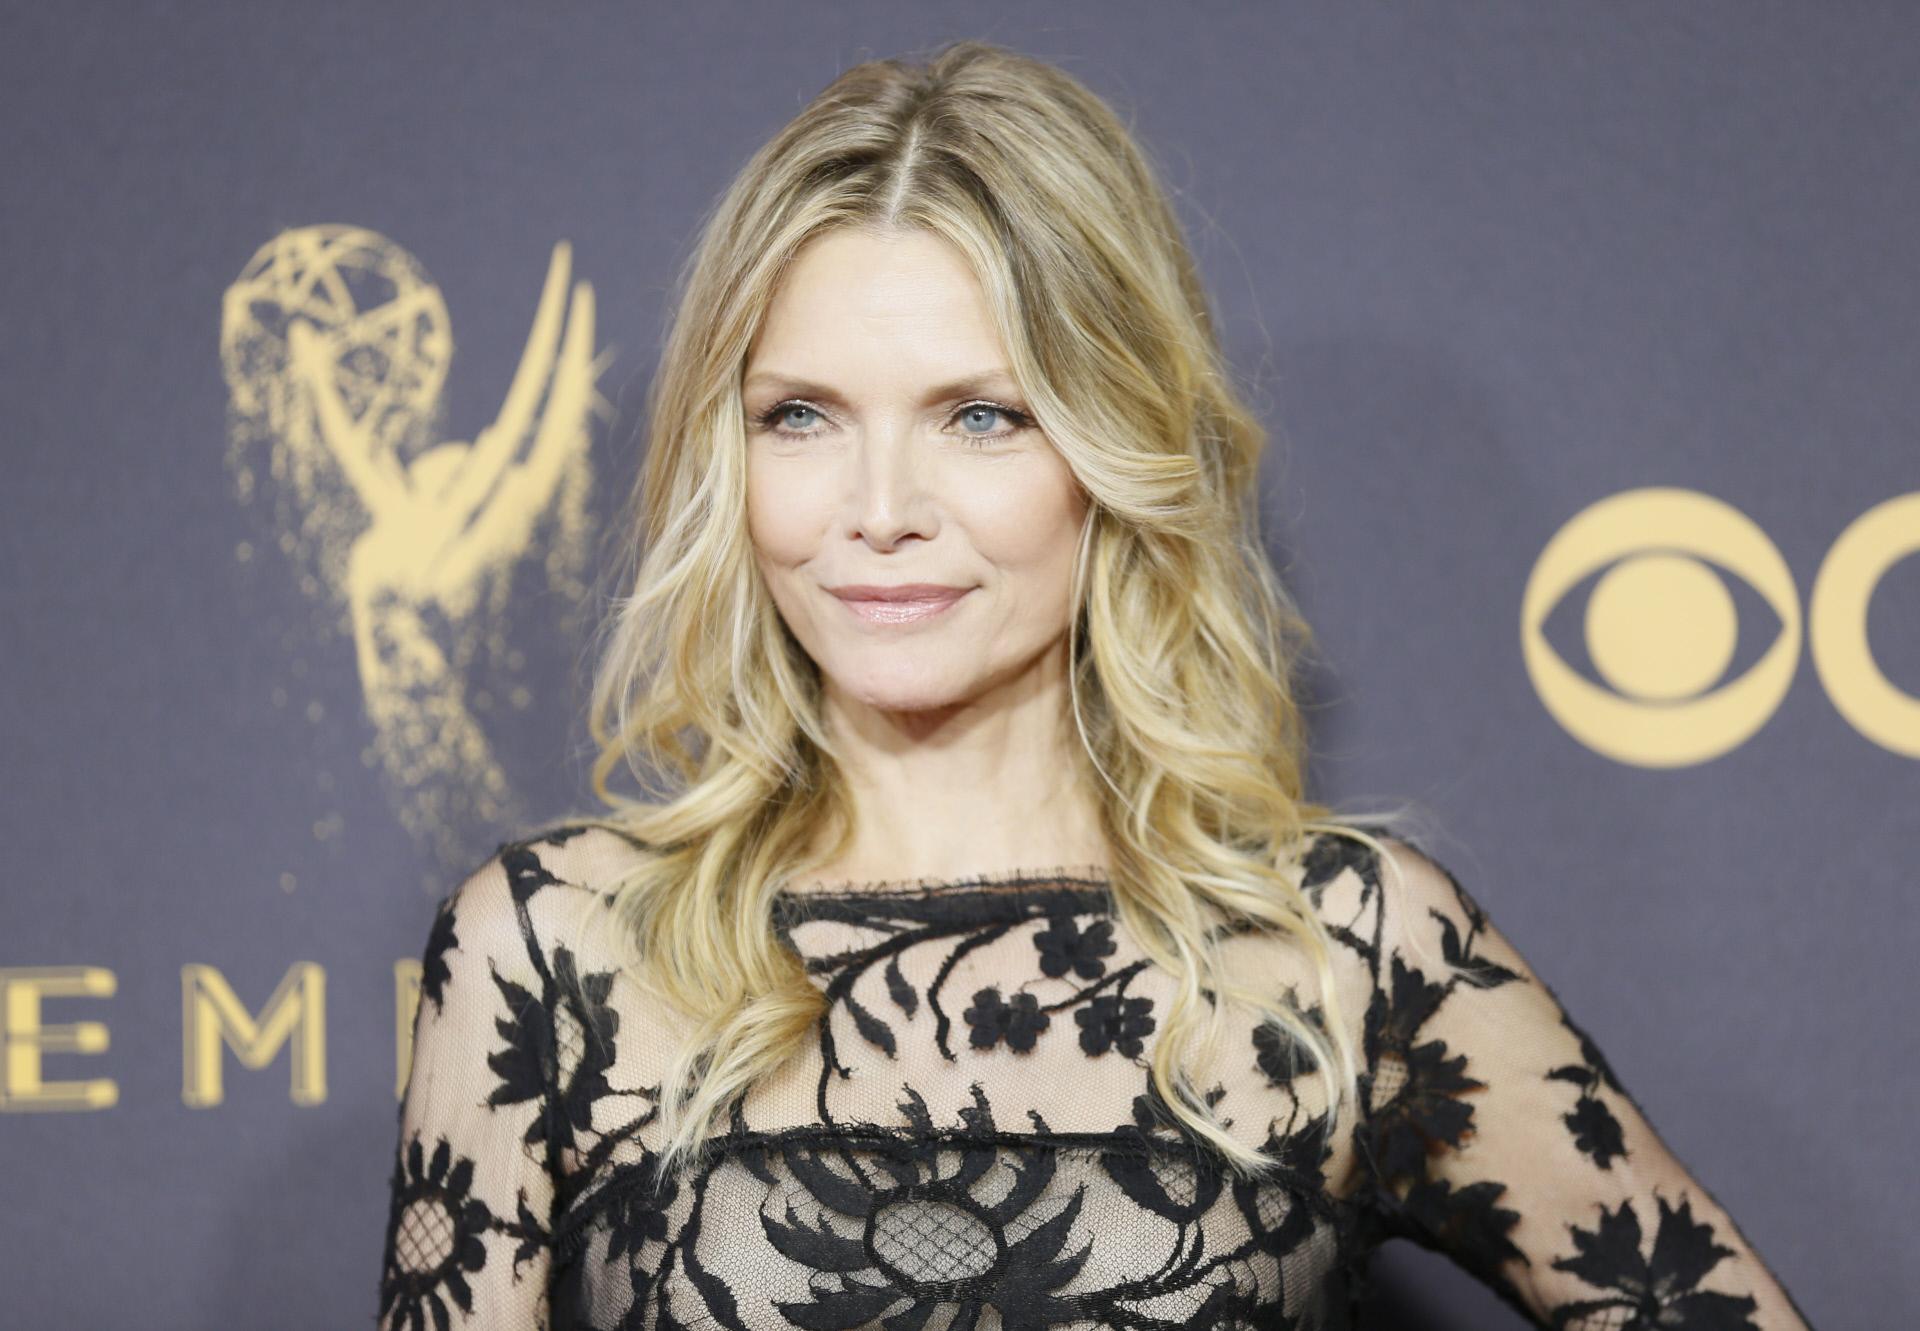 Michelle Pfeiffer con su corte icónico con capas ligeras o collarbone cut.